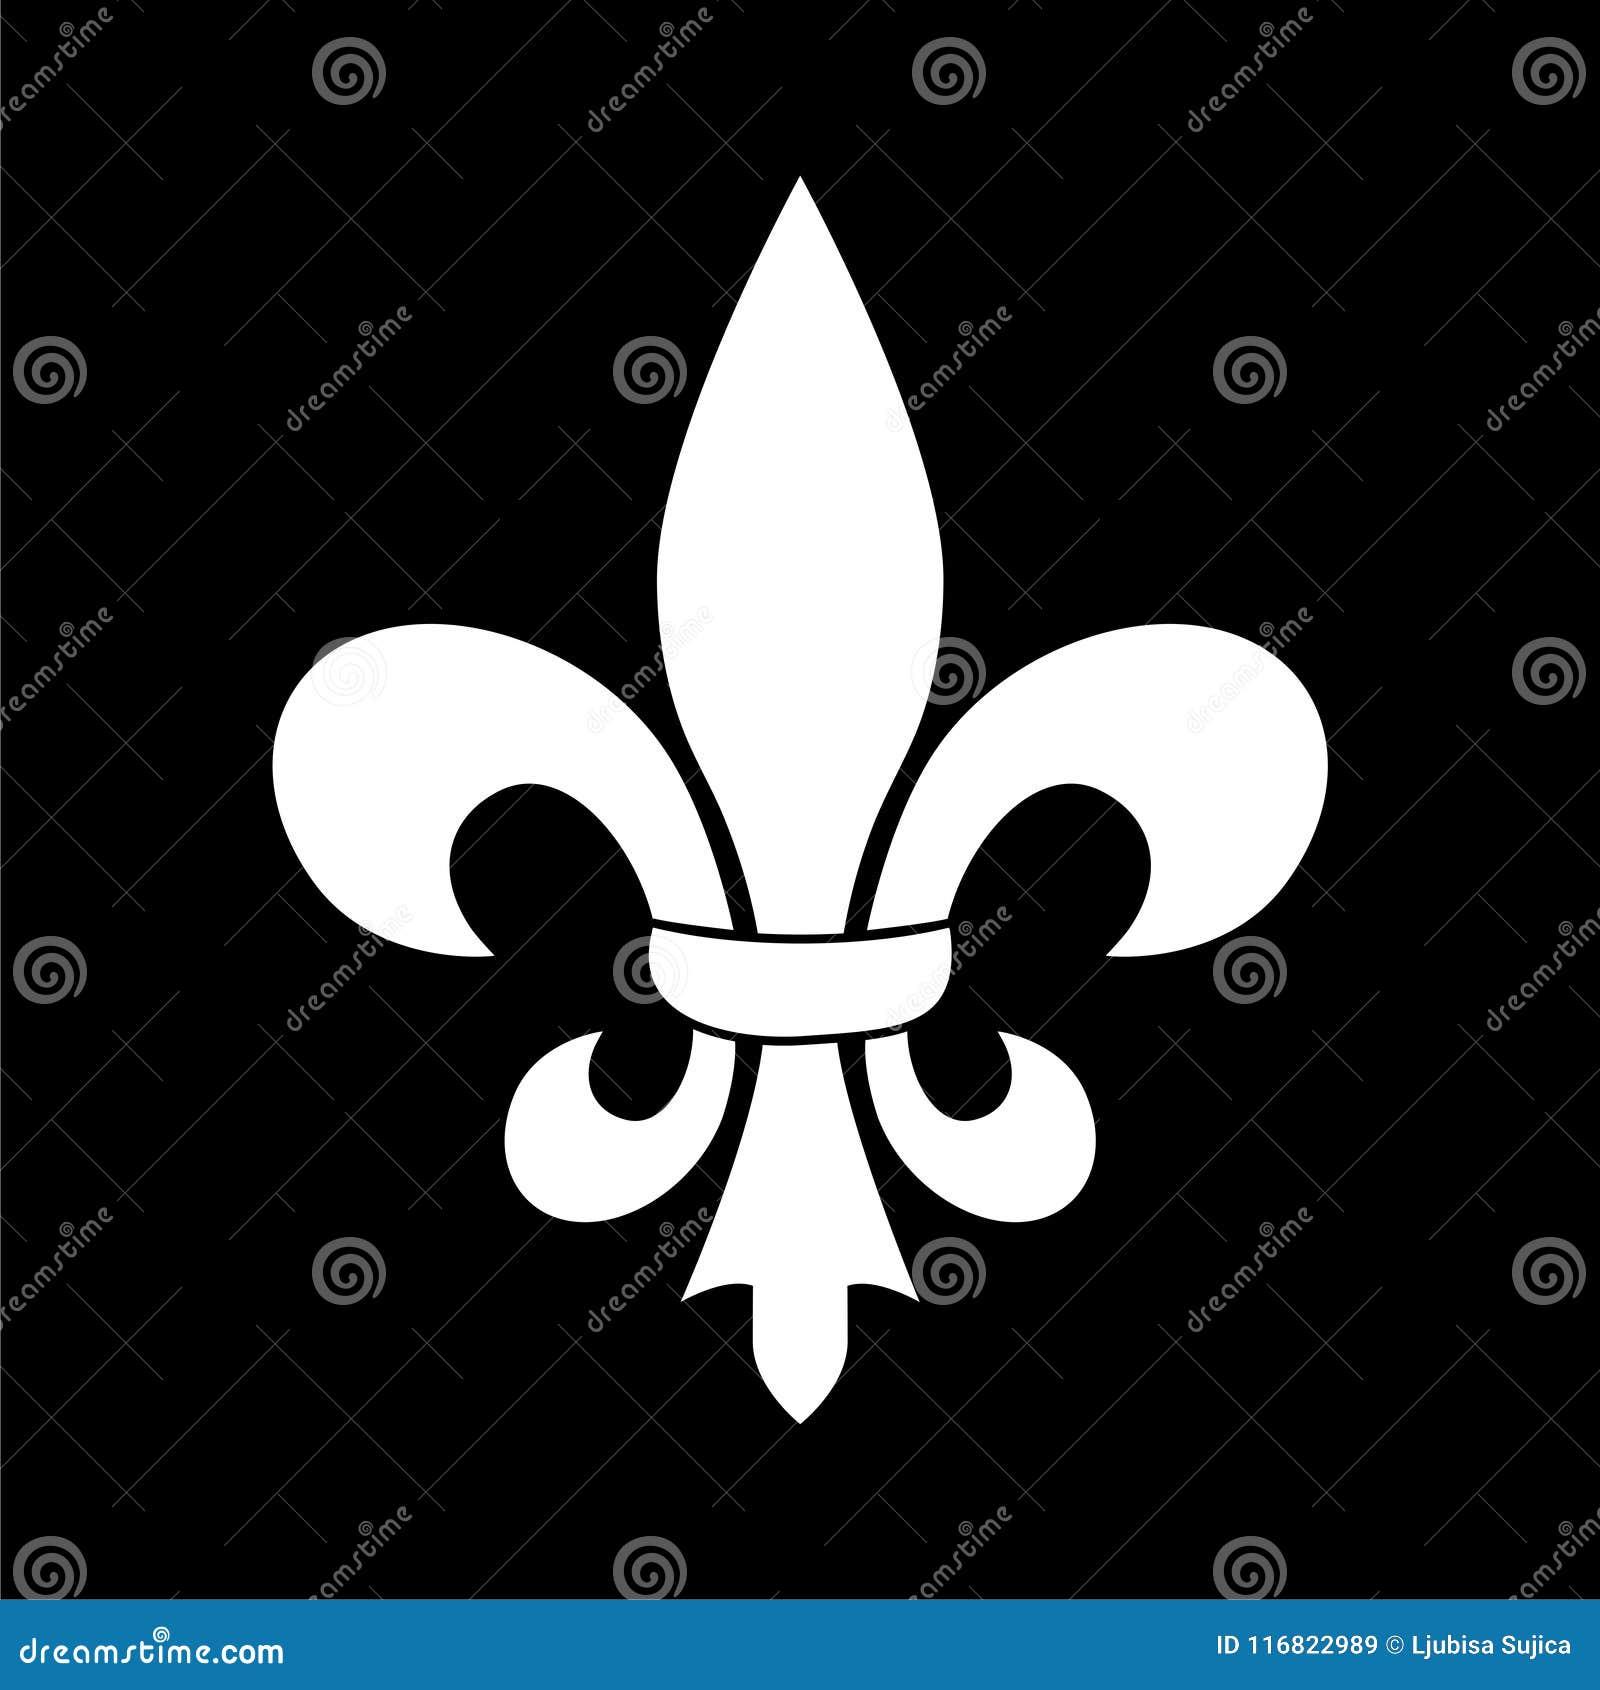 Fleur De Lis Icon Fleur De Lis Sign On Dark Background Stock Vector